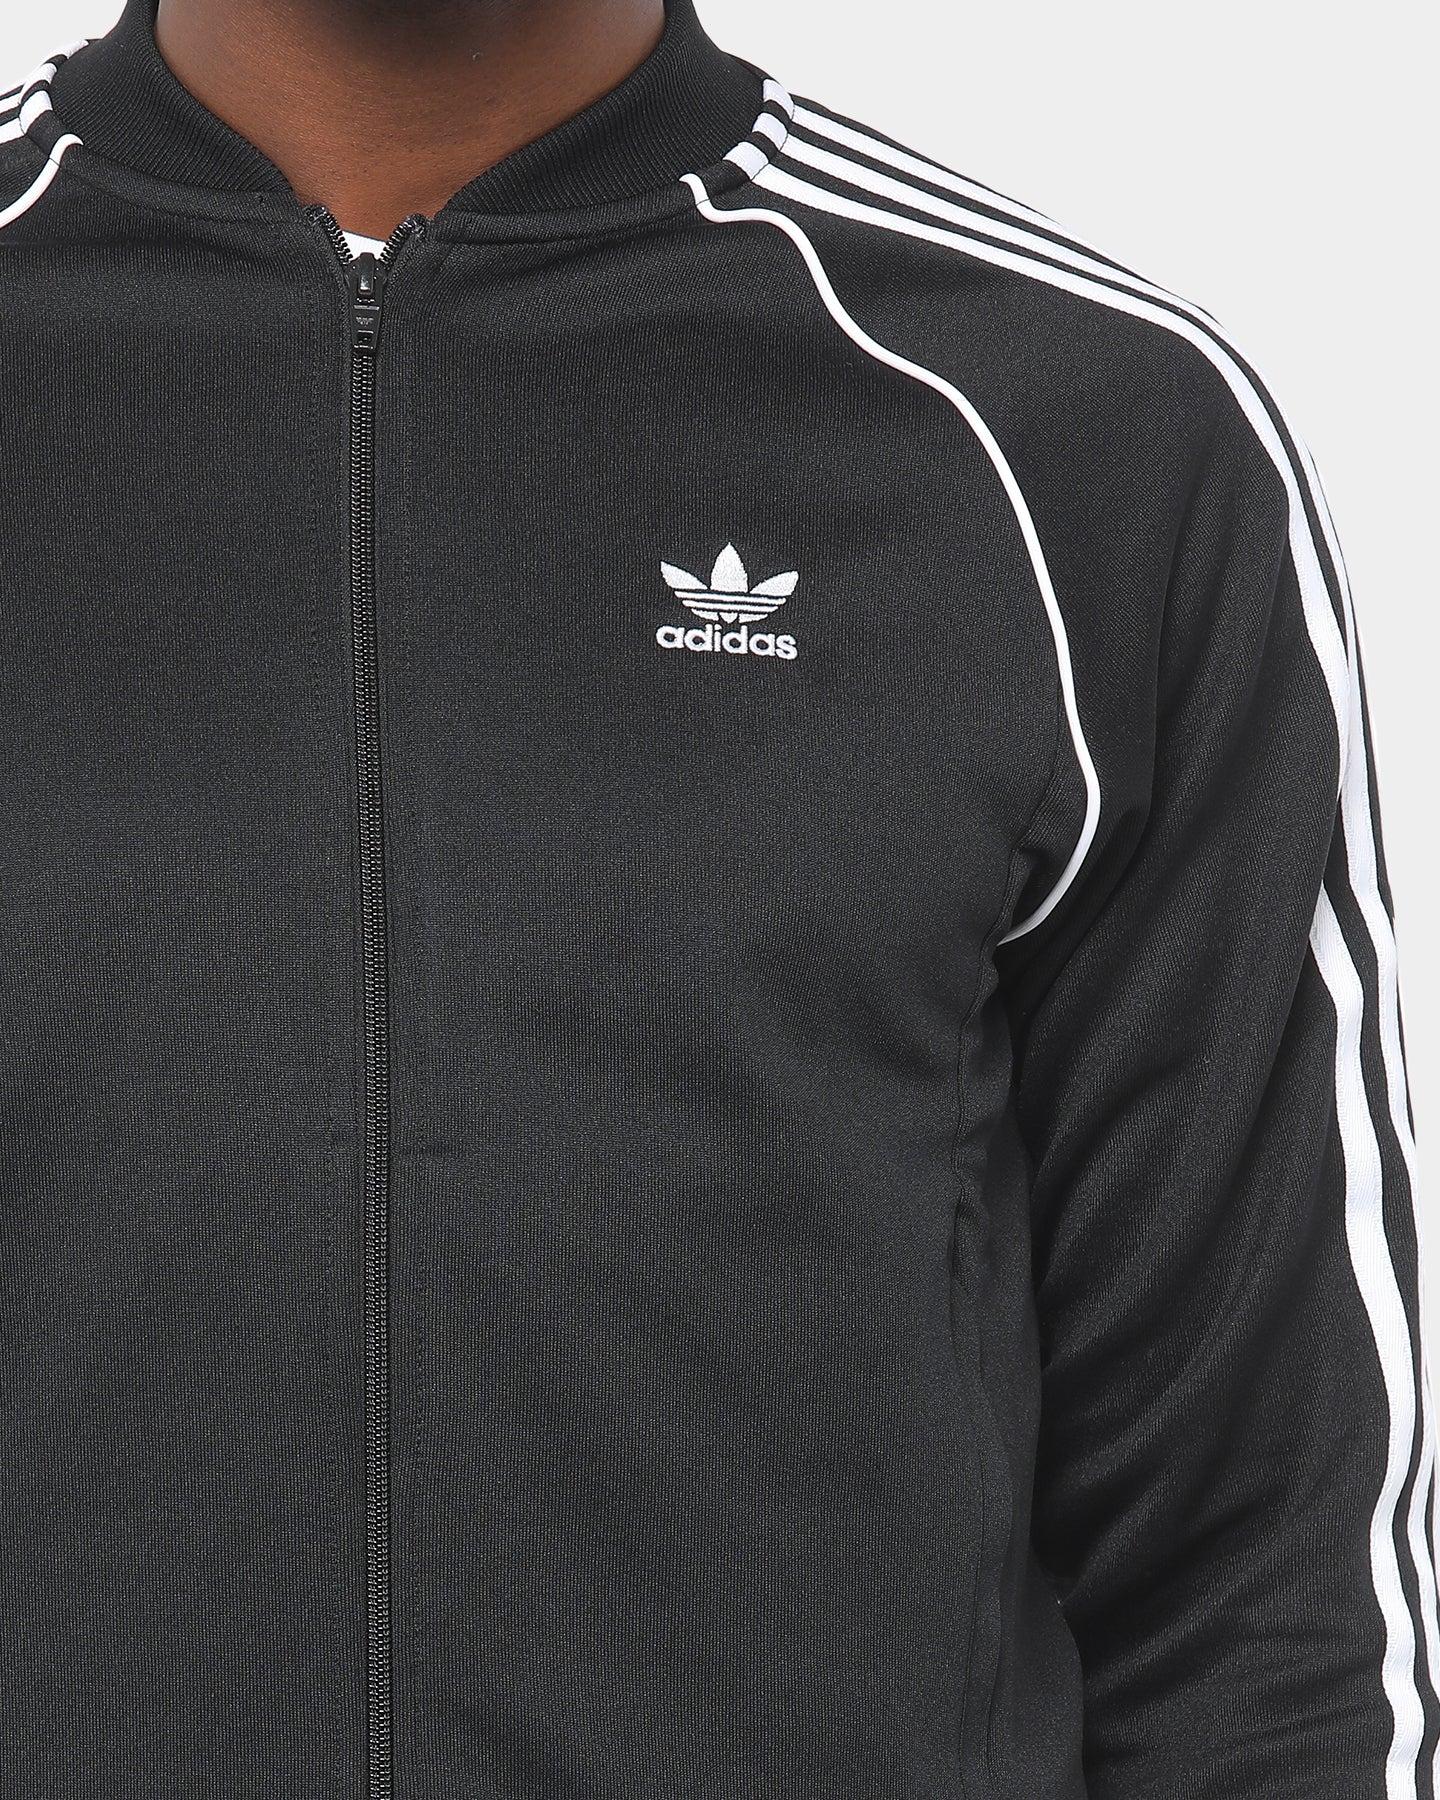 Track Jacket SST 24 sweatshirt in black